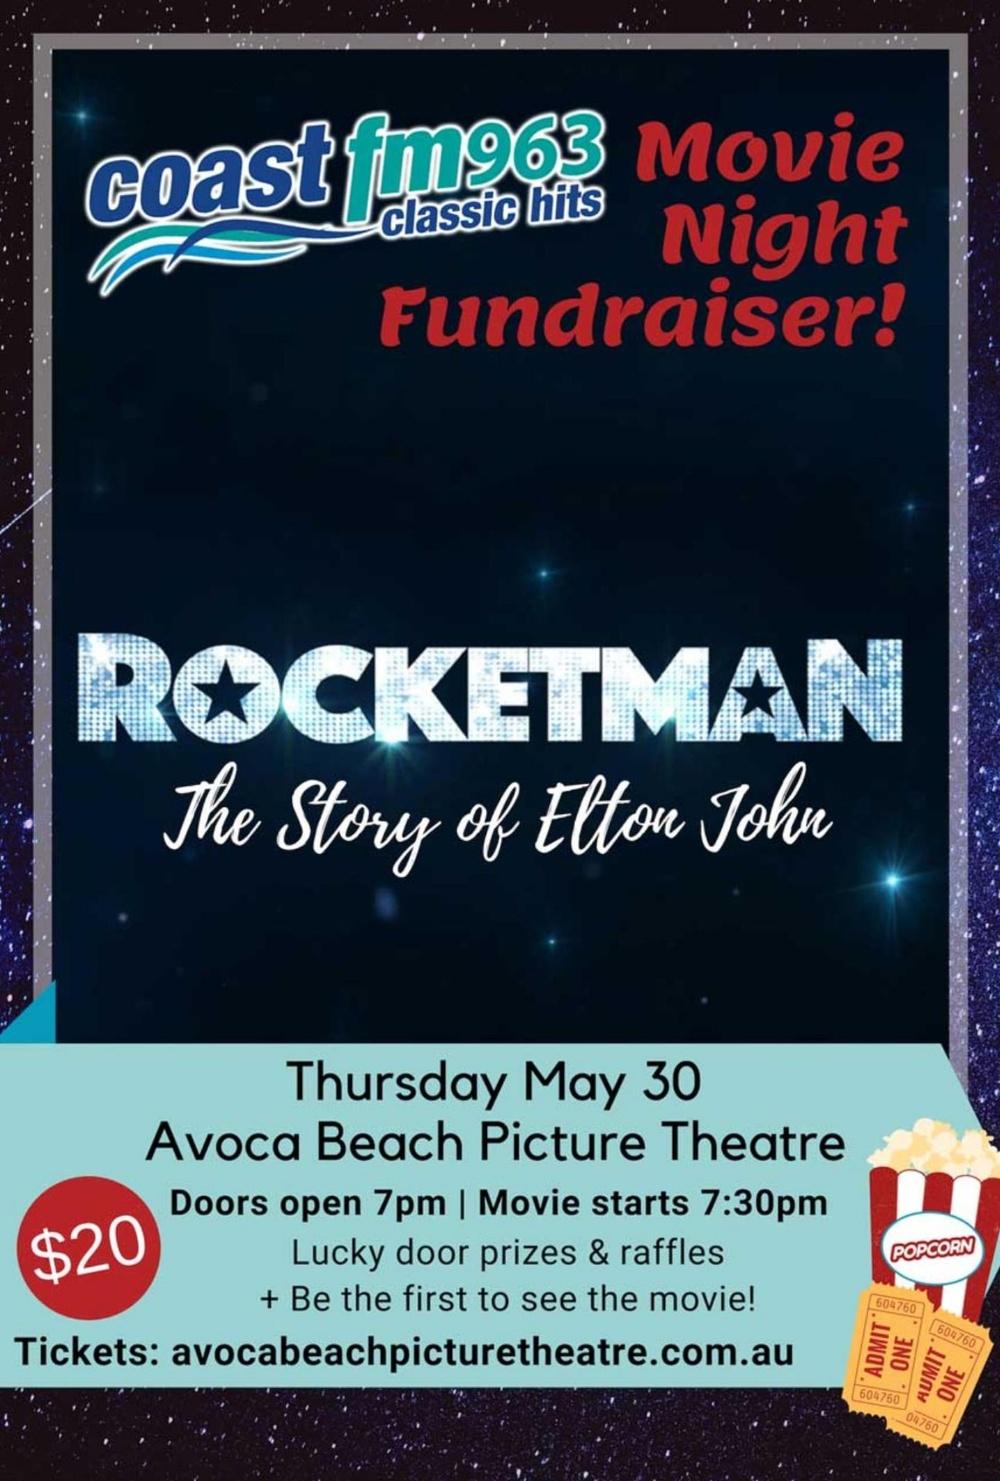 Central Coast Movie Premiere - Rocketman - Avoca, NSW